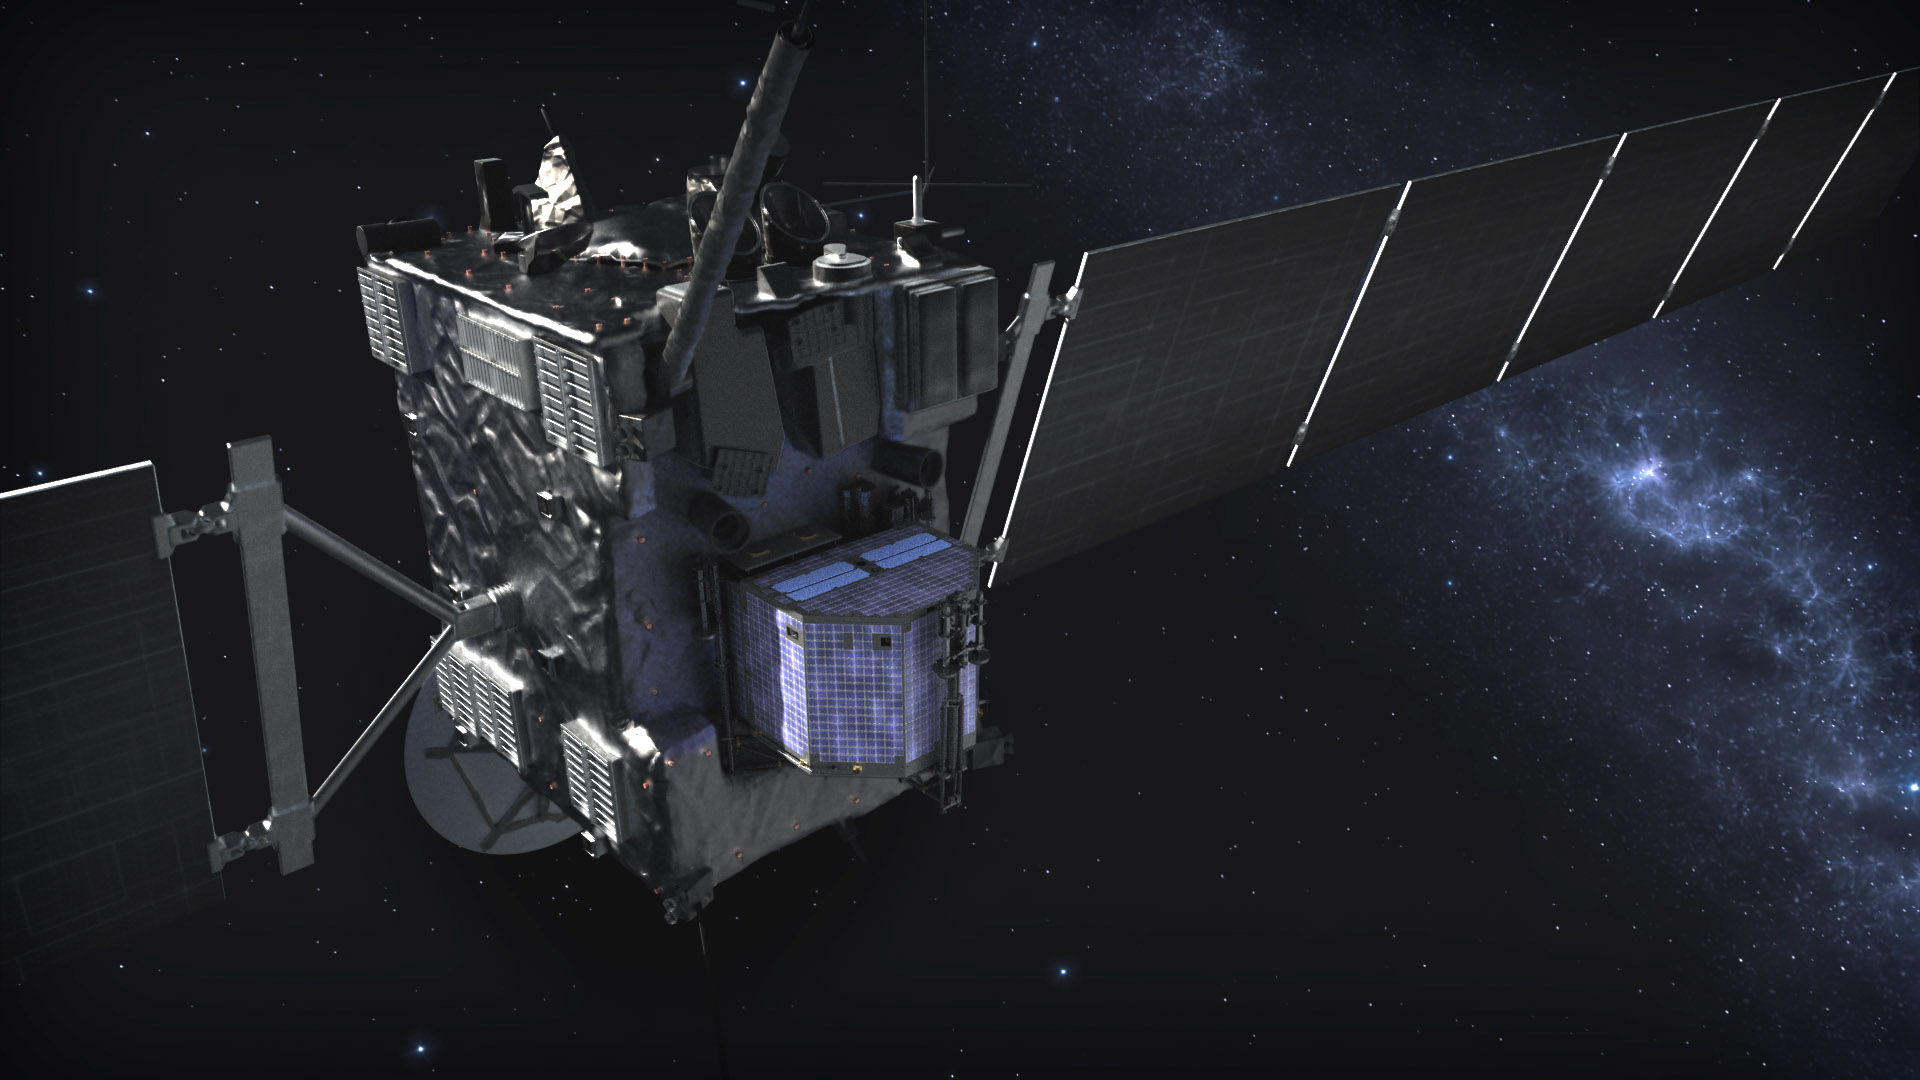 Philae, Rosetta, kometa 65P/Churyumov Gerasimenko, ESA, Rosetta